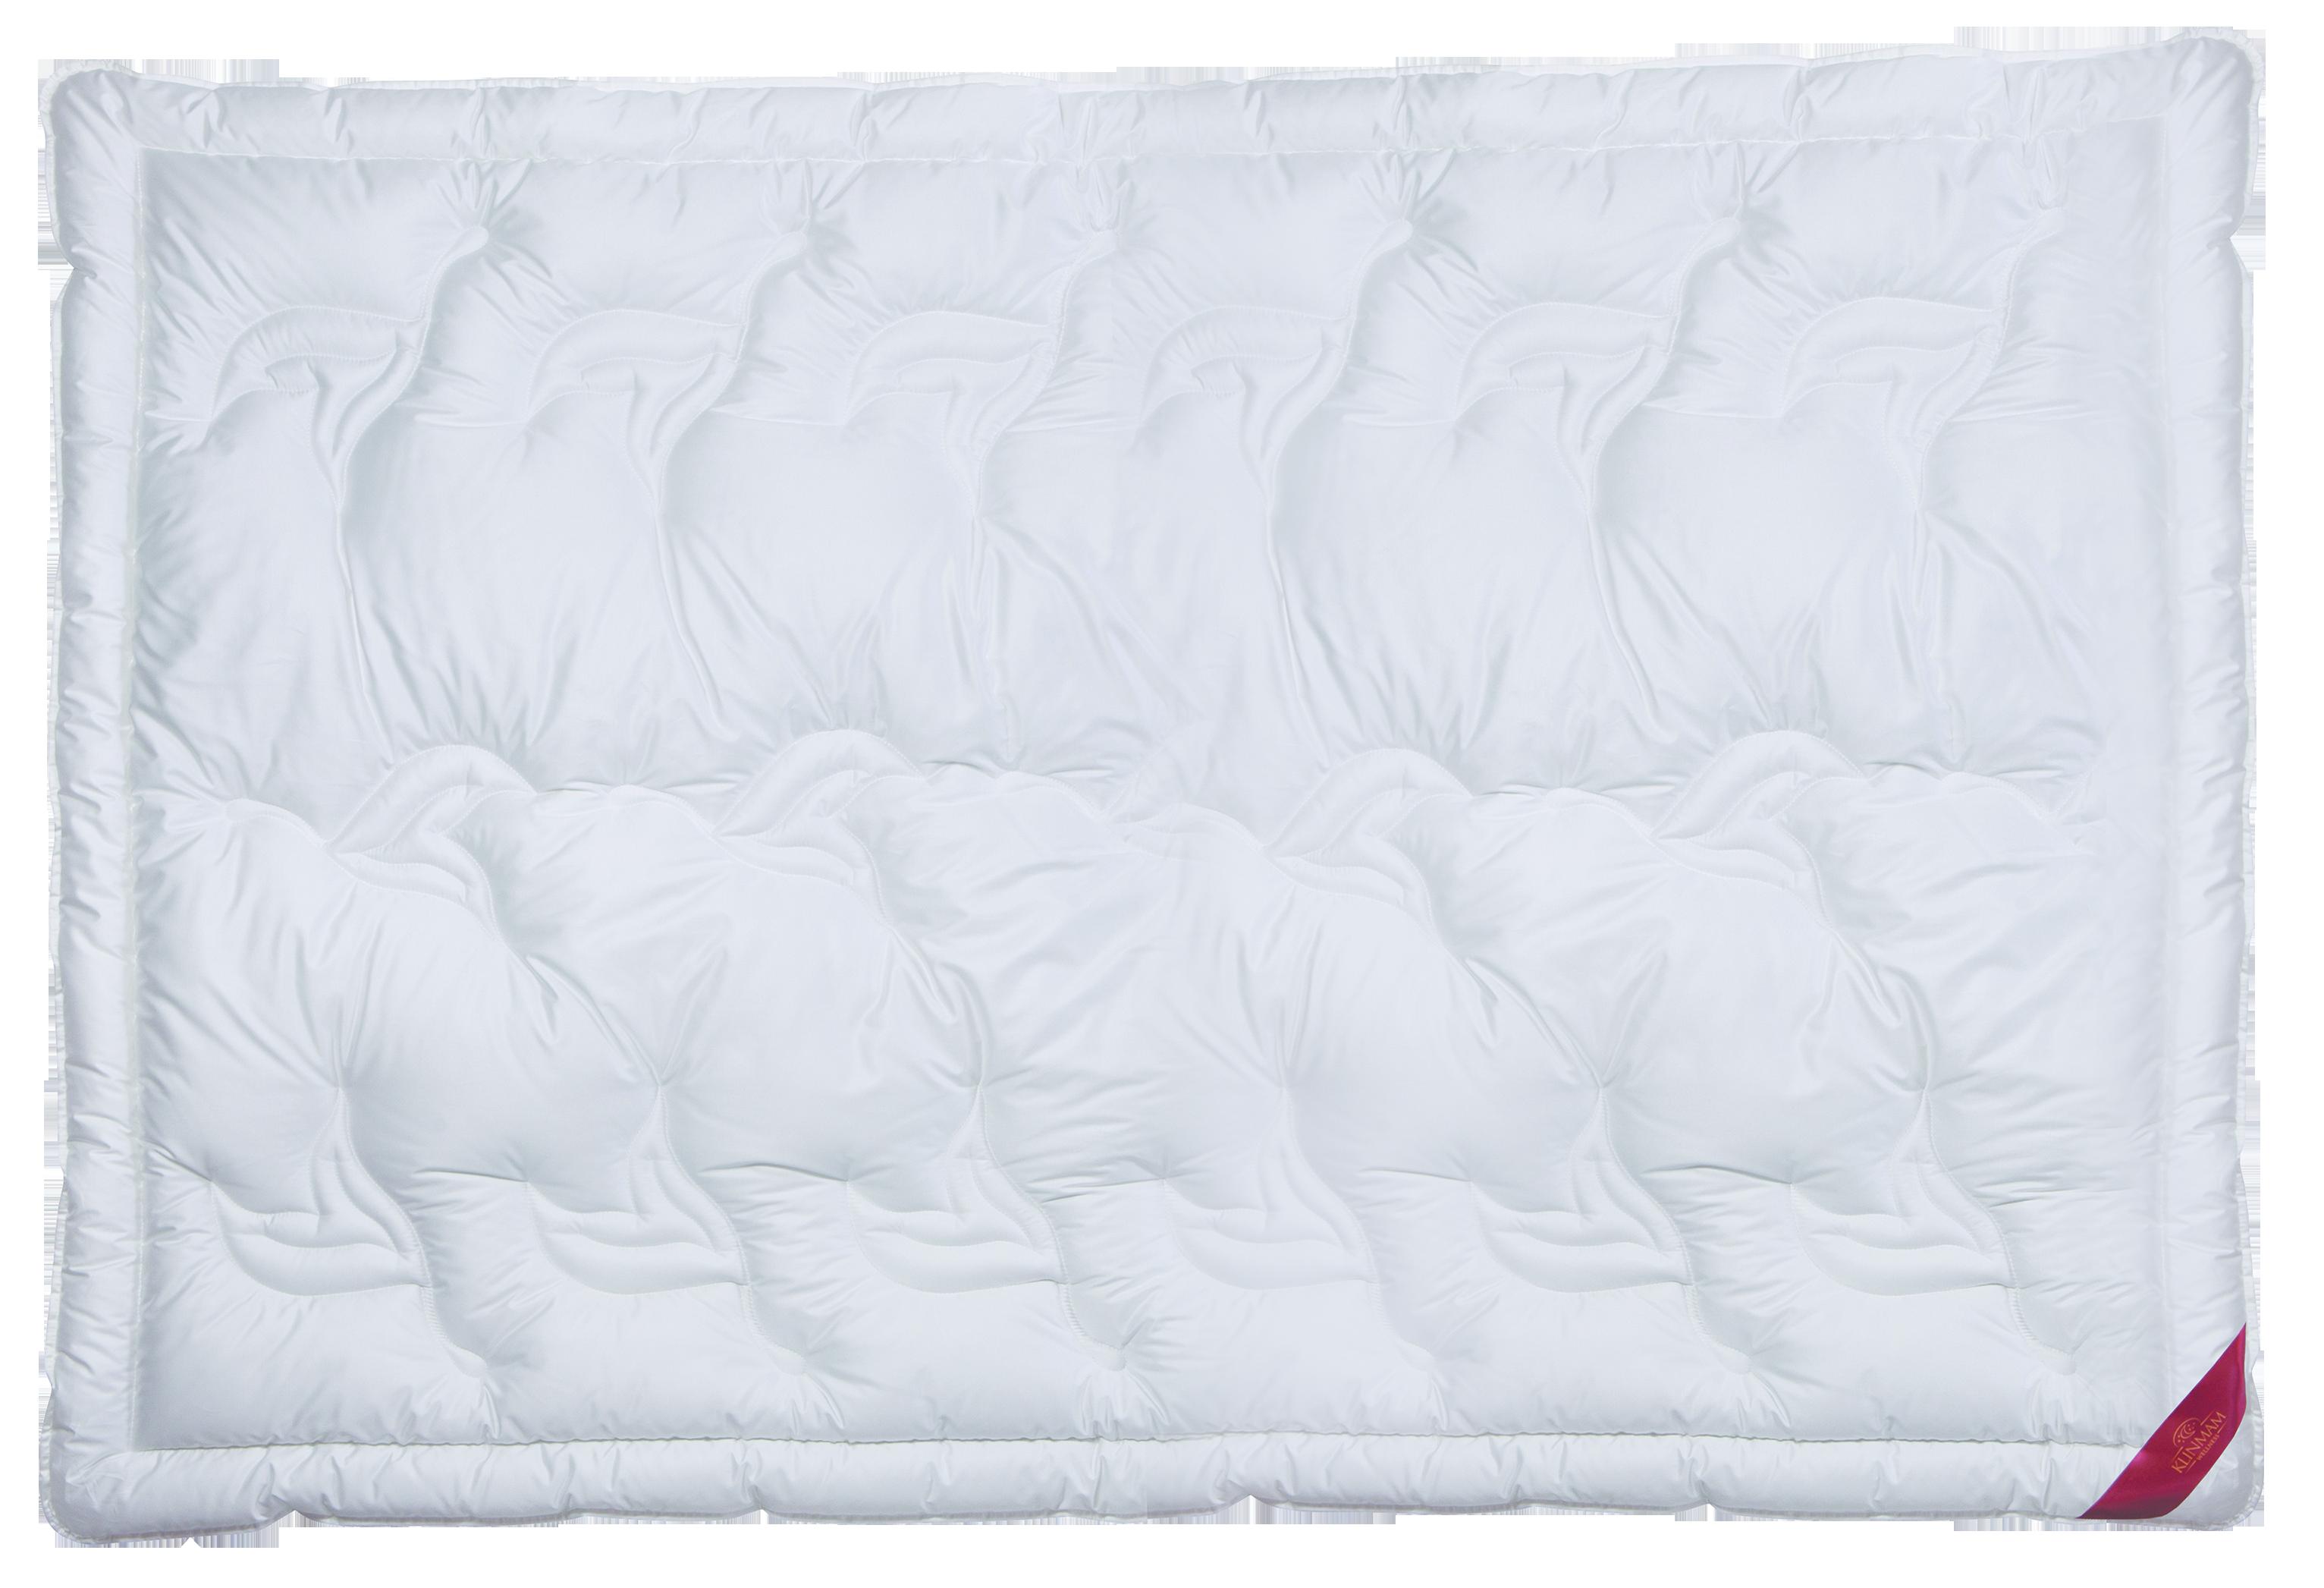 Tencel Klinmam přikrývka - 135 x 200 cm - Klinmam